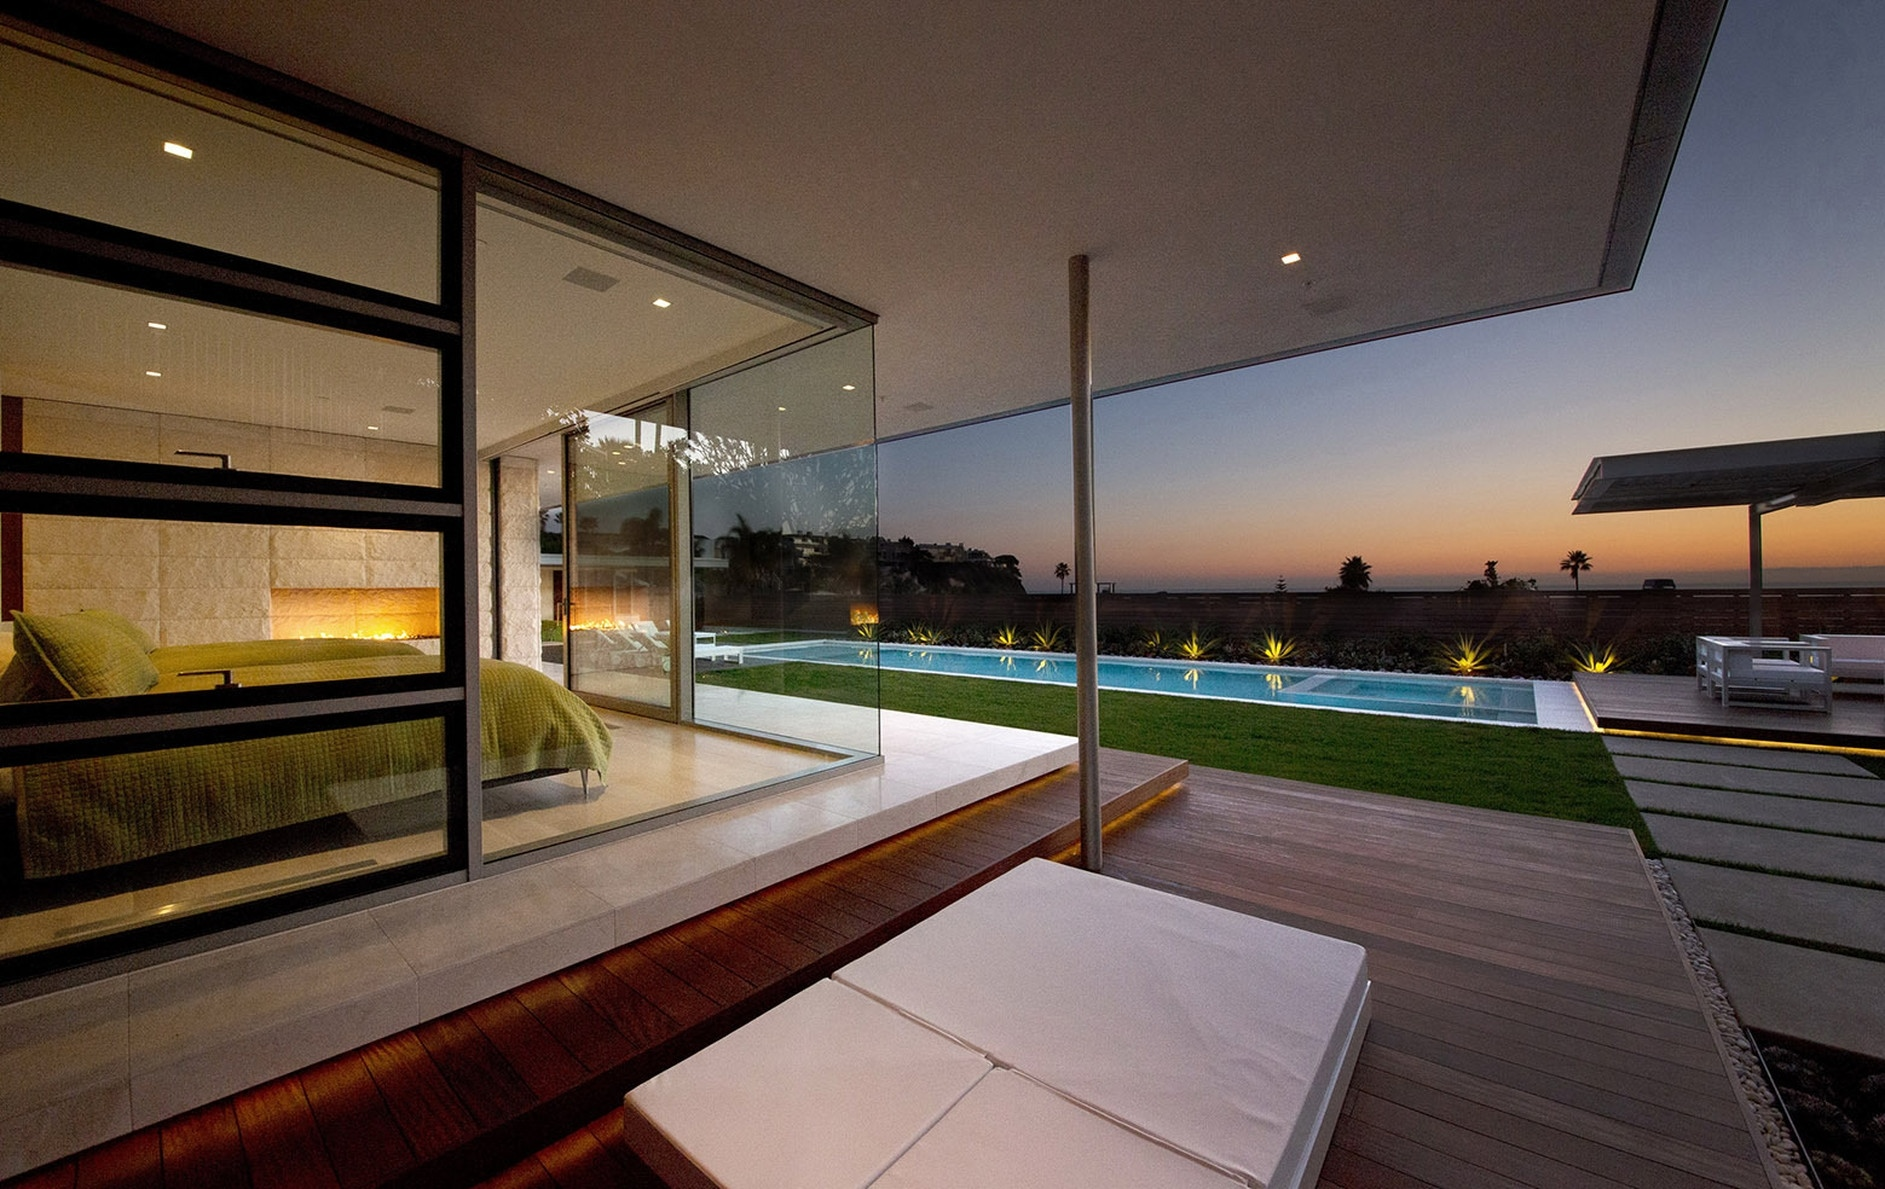 Mcelroy house by ehrlich architects karmatrendz - Limposante residence contemporaine de ehrlich architects ...